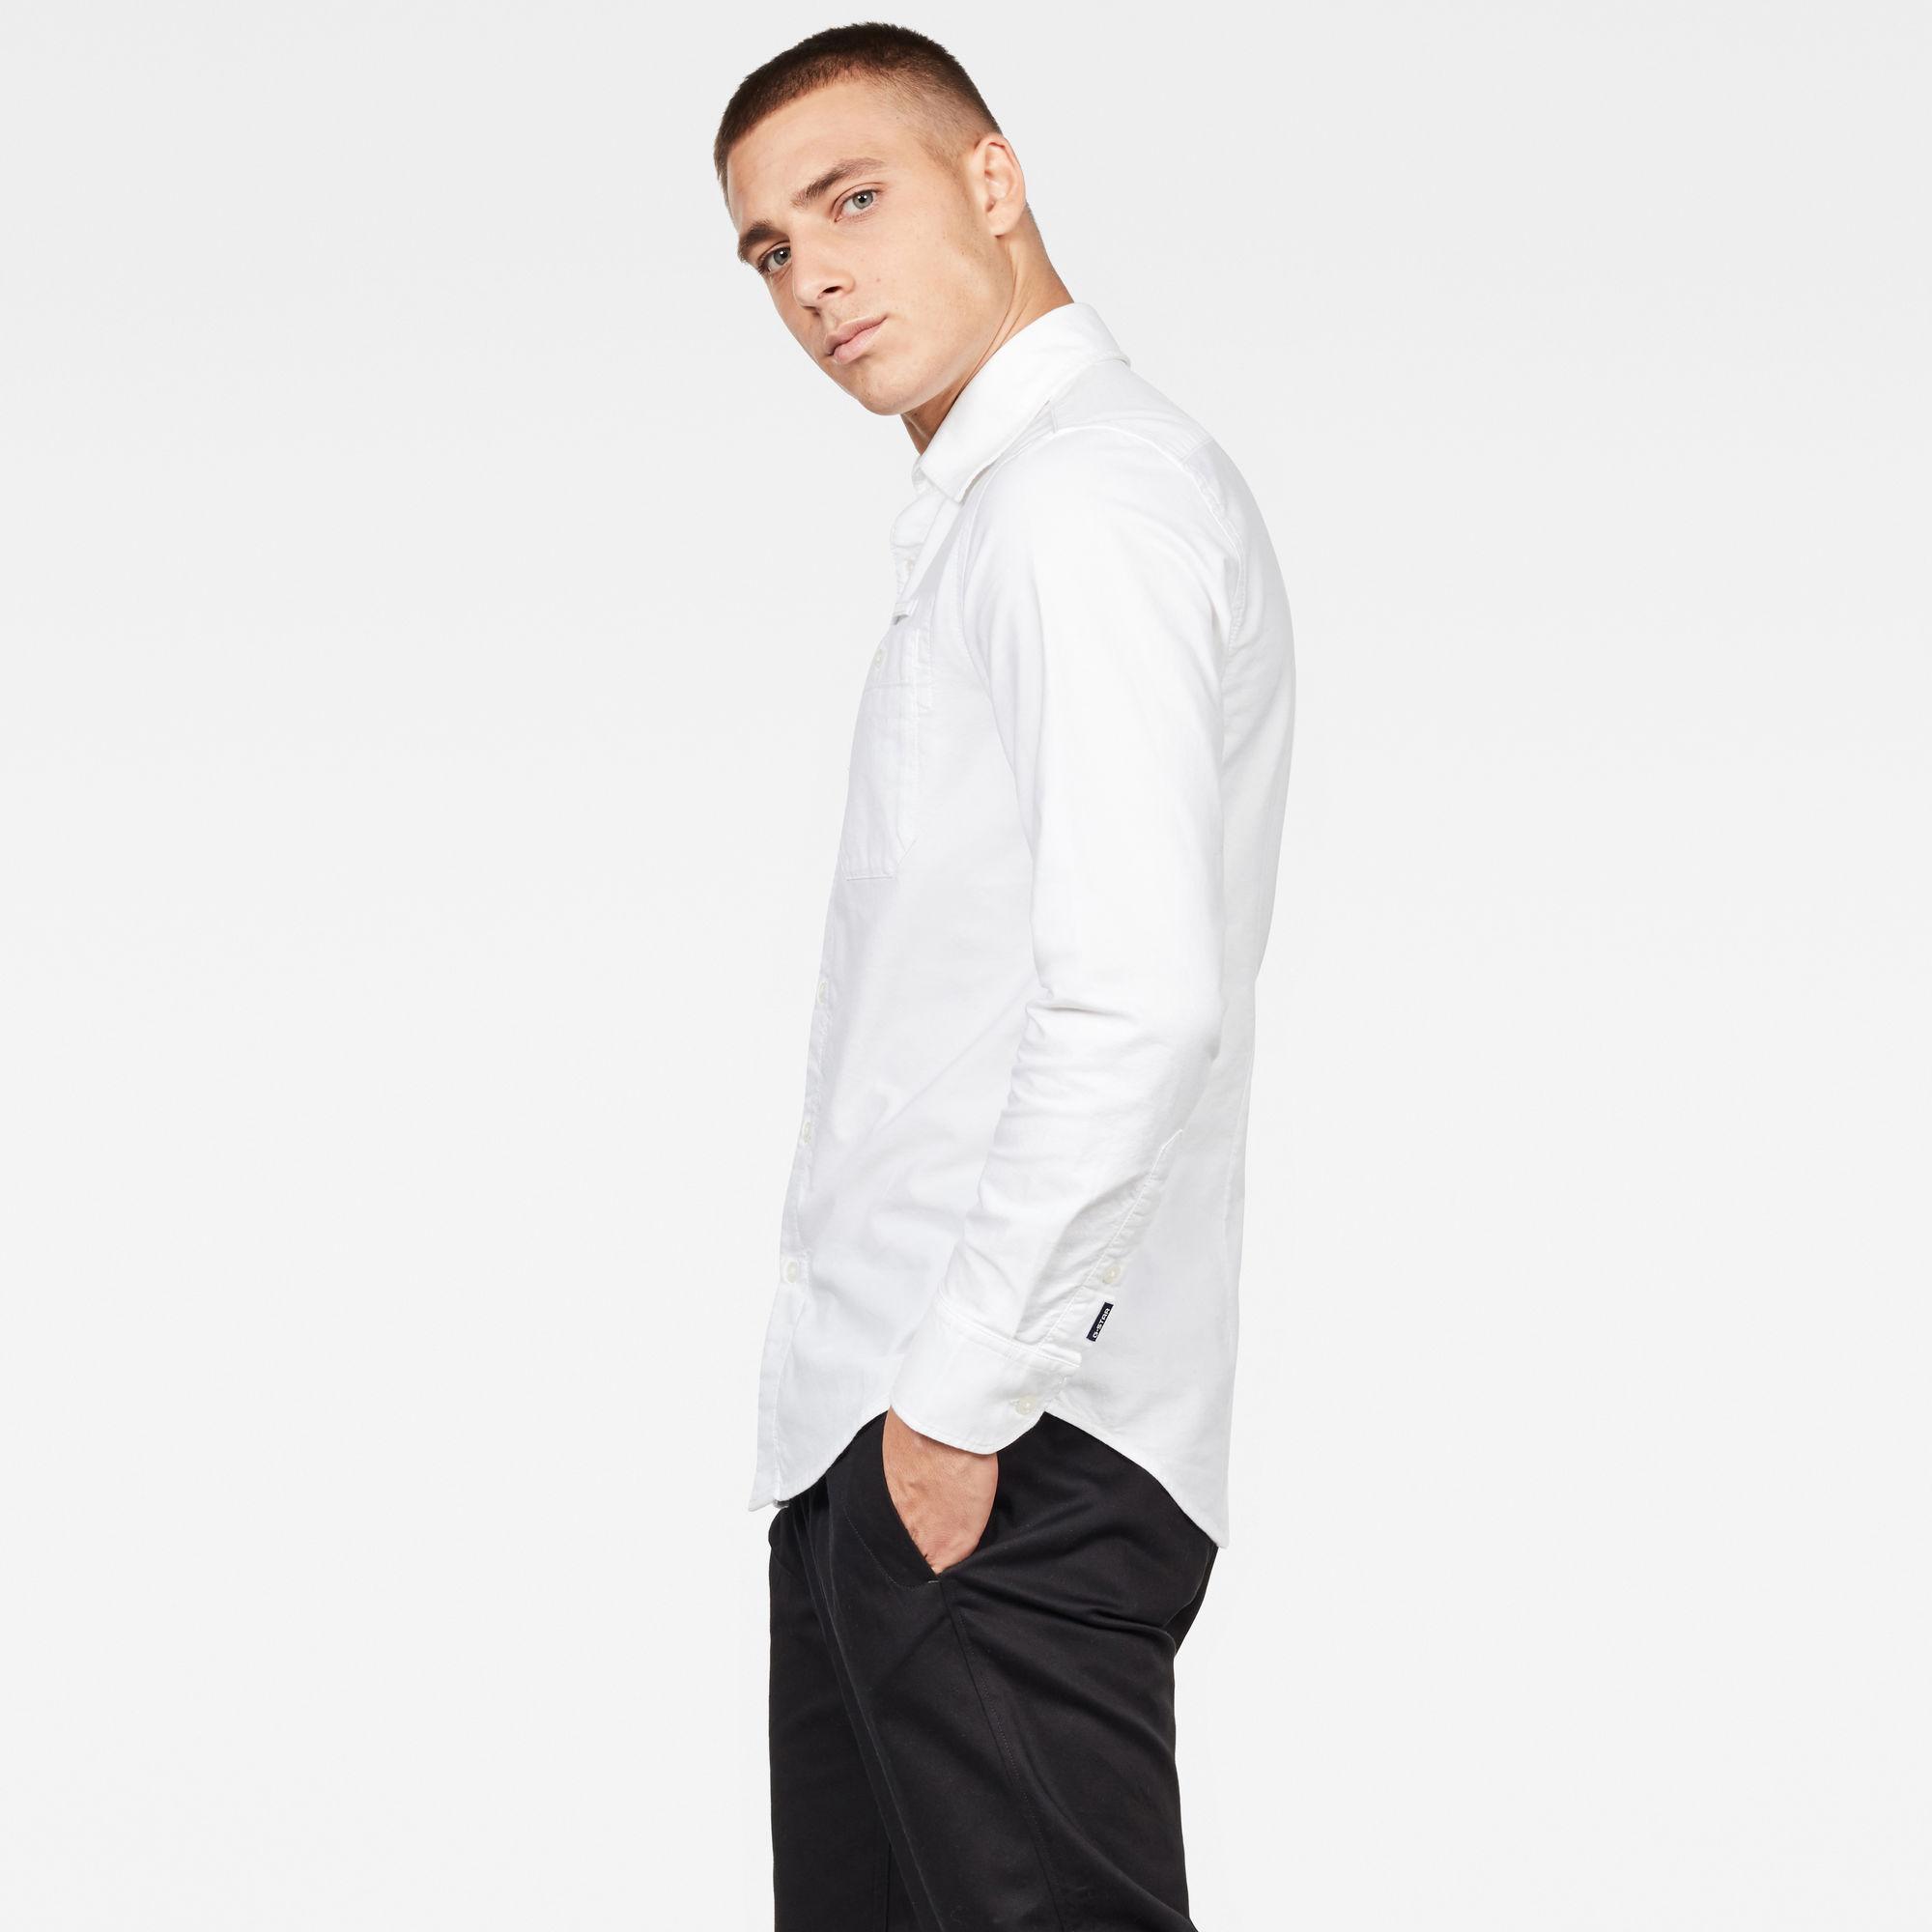 Bristum 1 Pocket Slim Overhemd